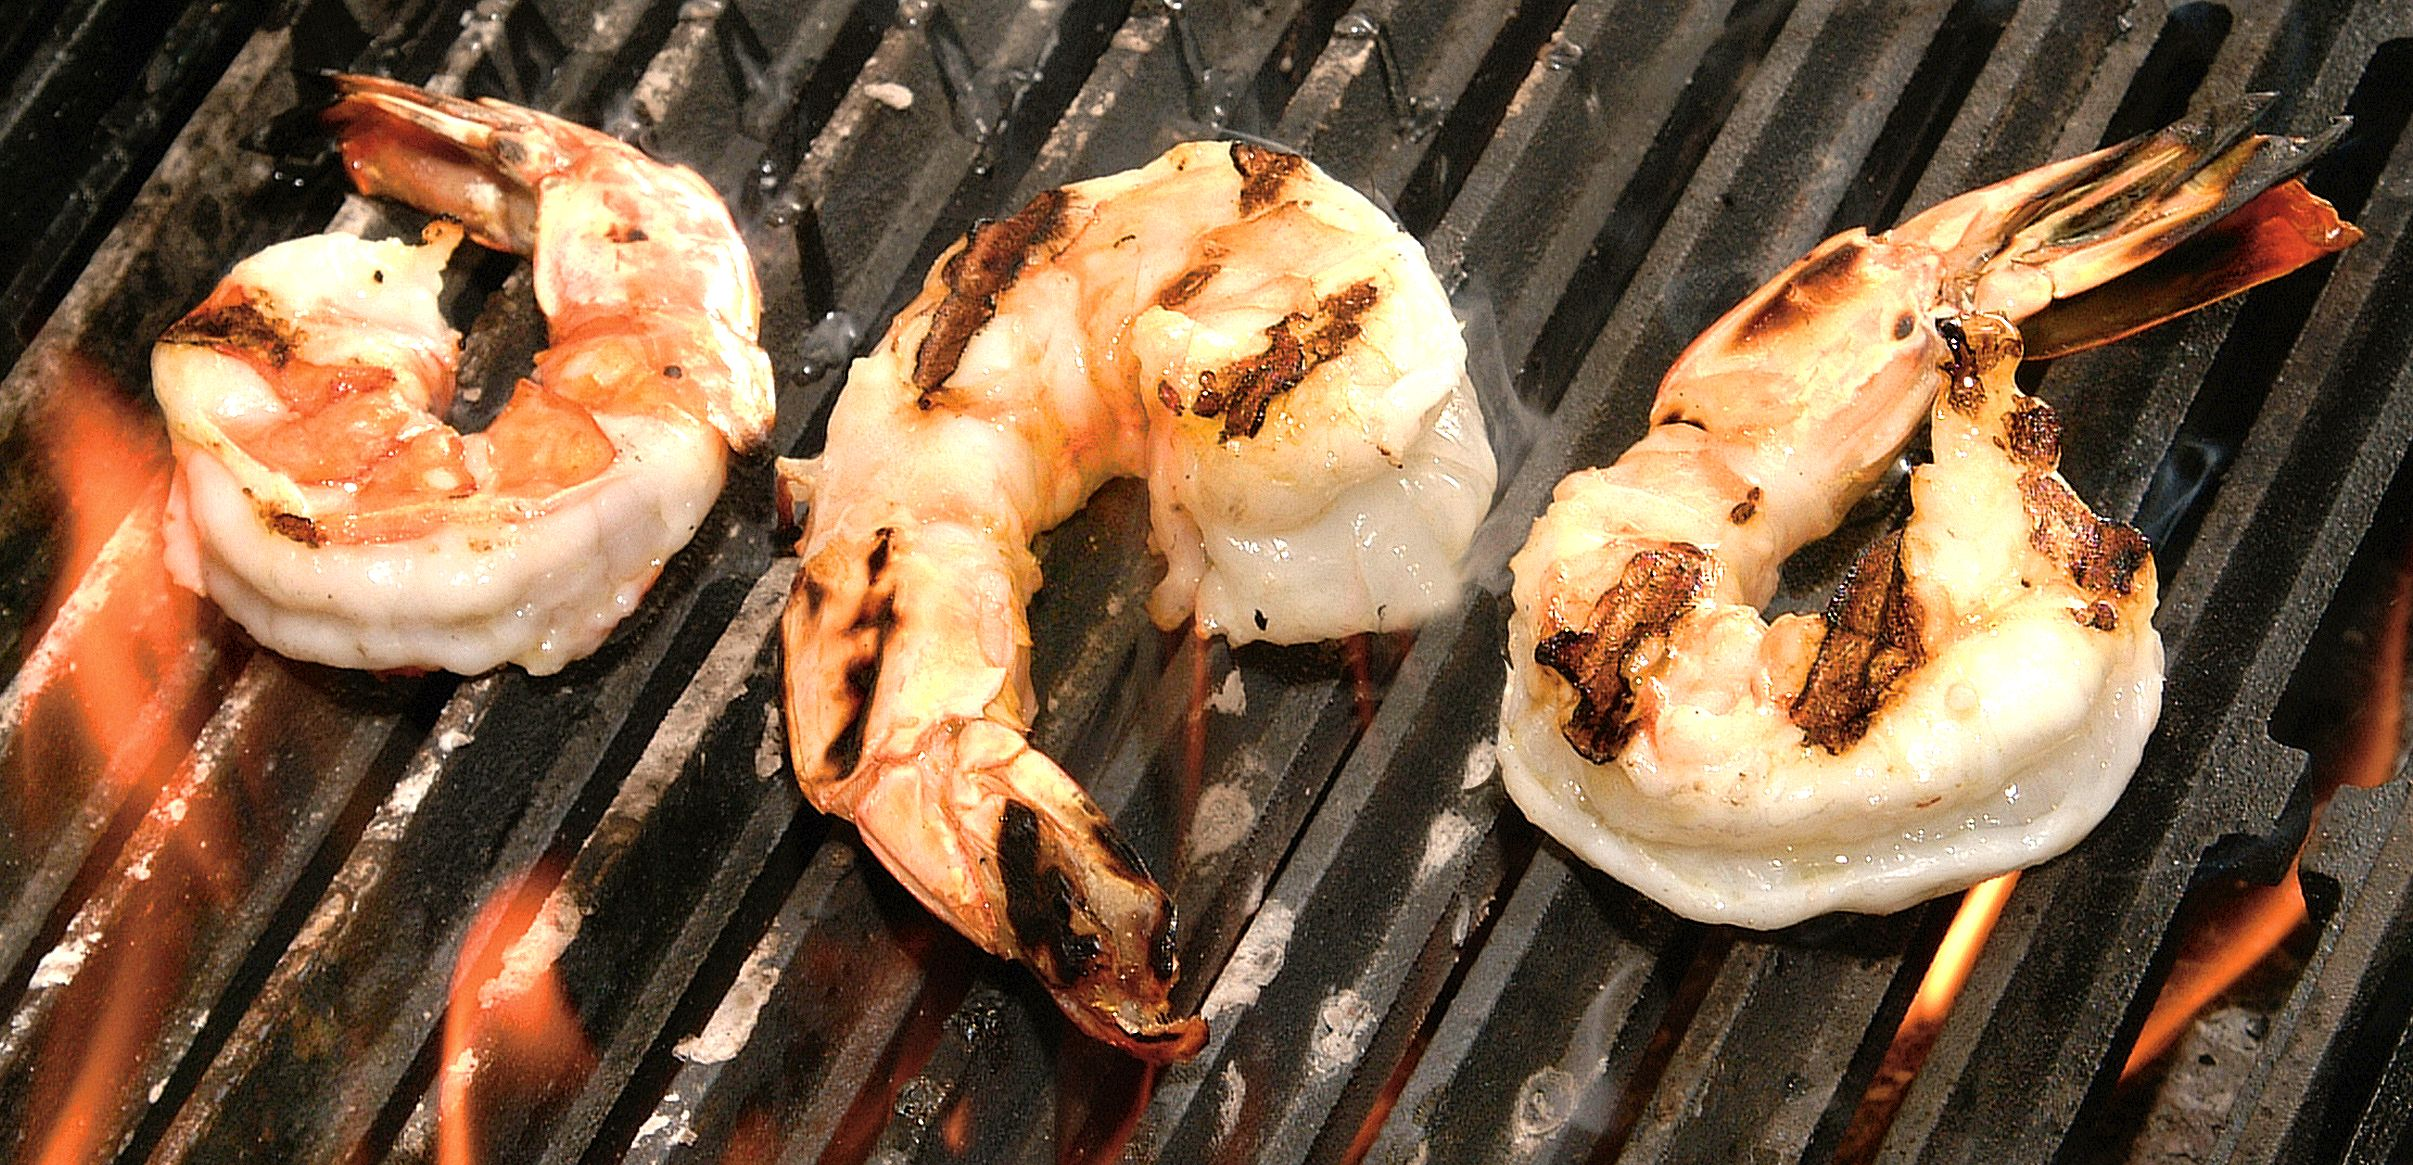 shrimp-on-grill.jpg